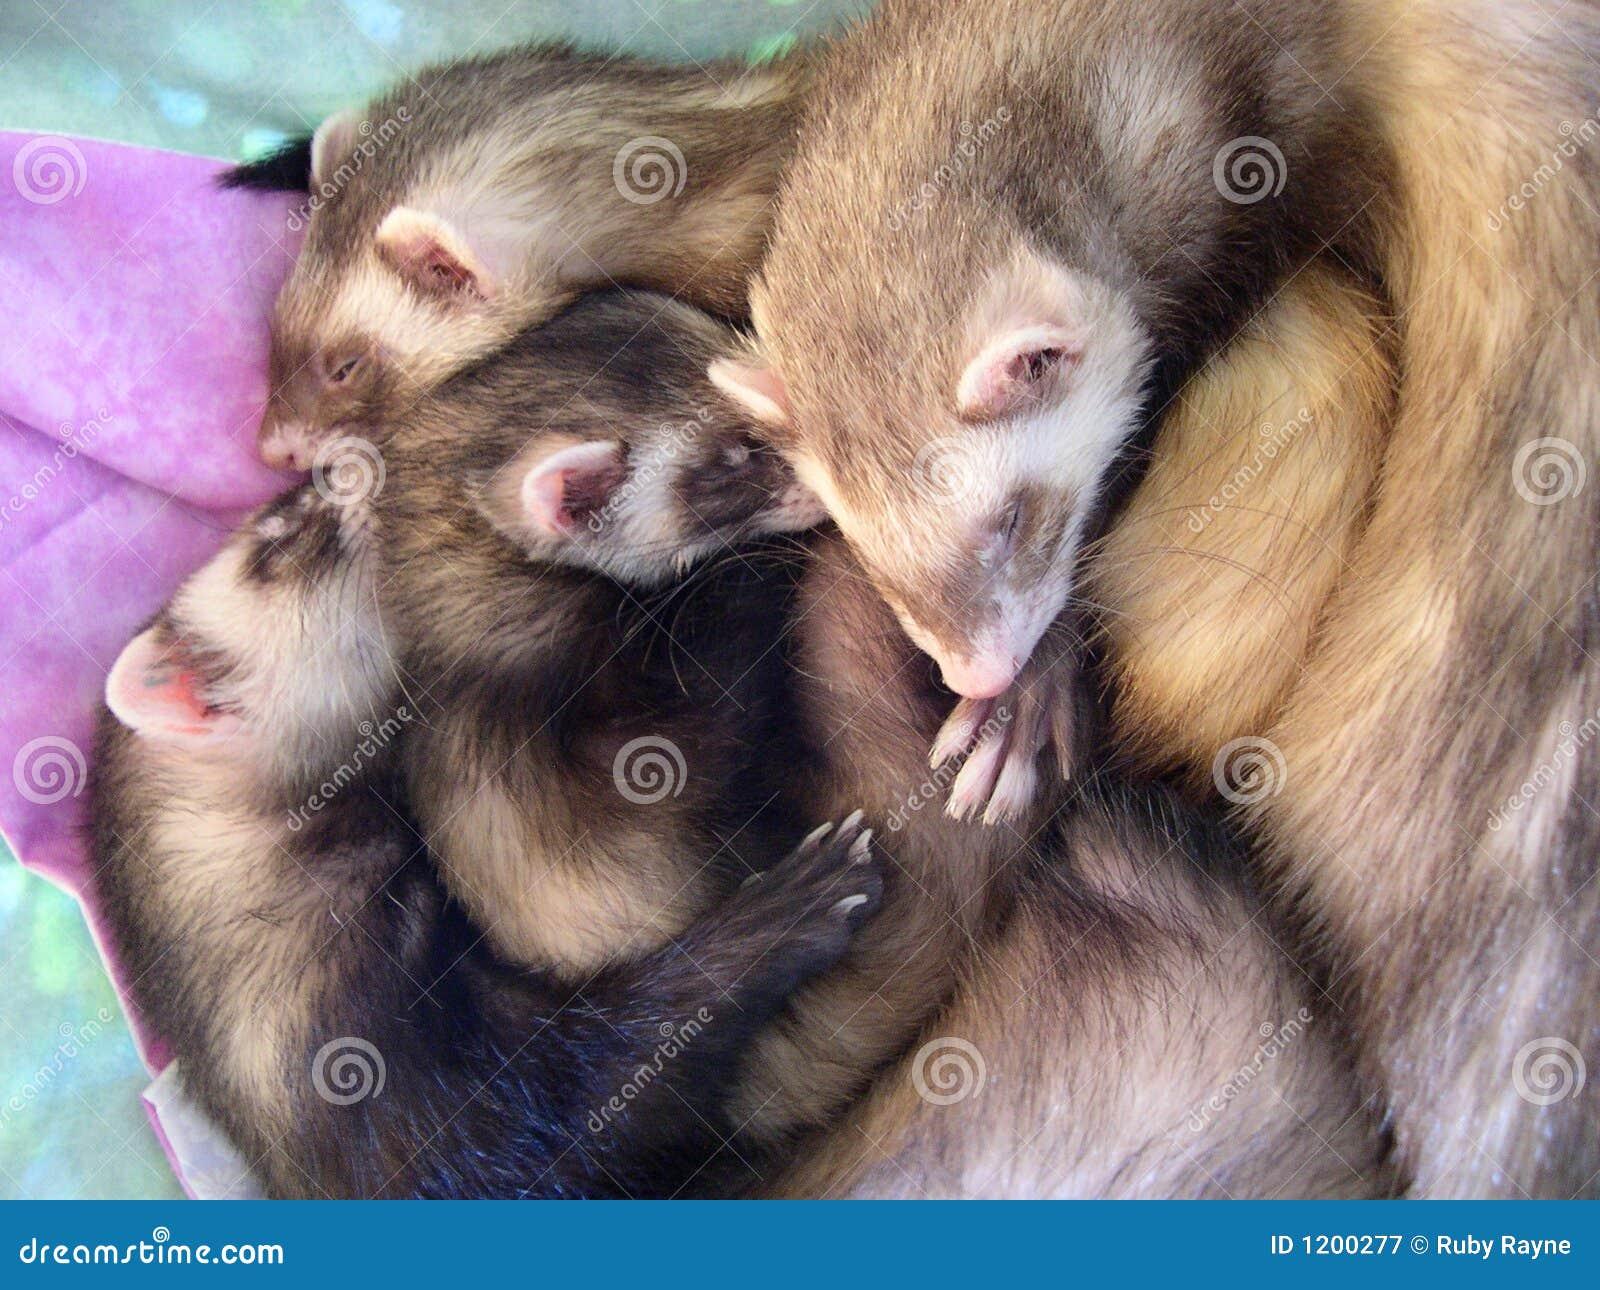 4 Beautiful Sleeping Ferrets